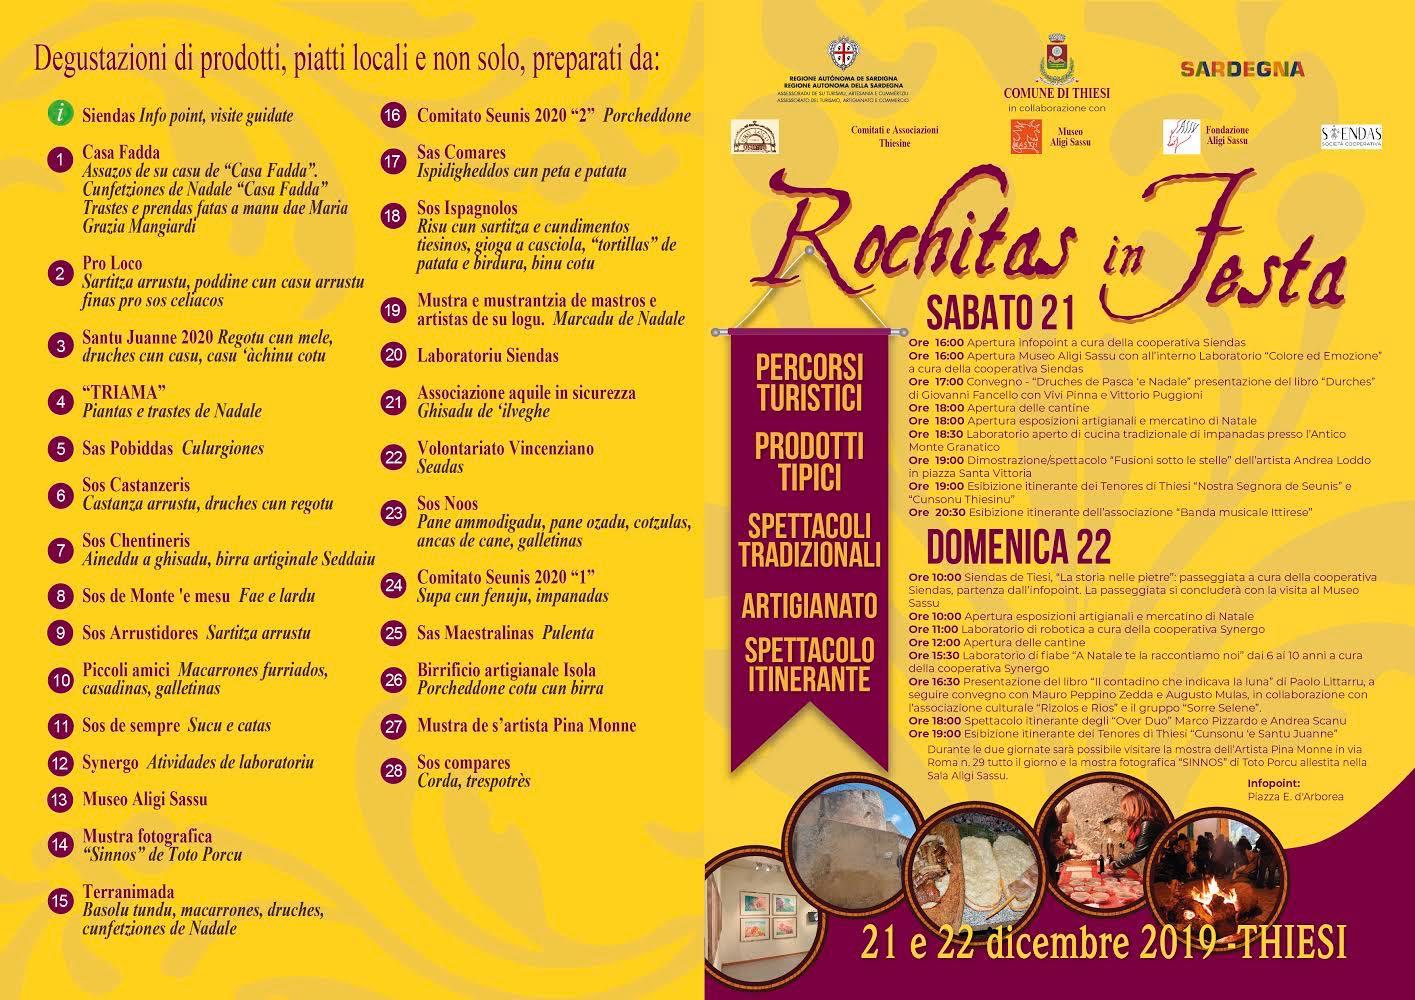 rochitas_festa_programma